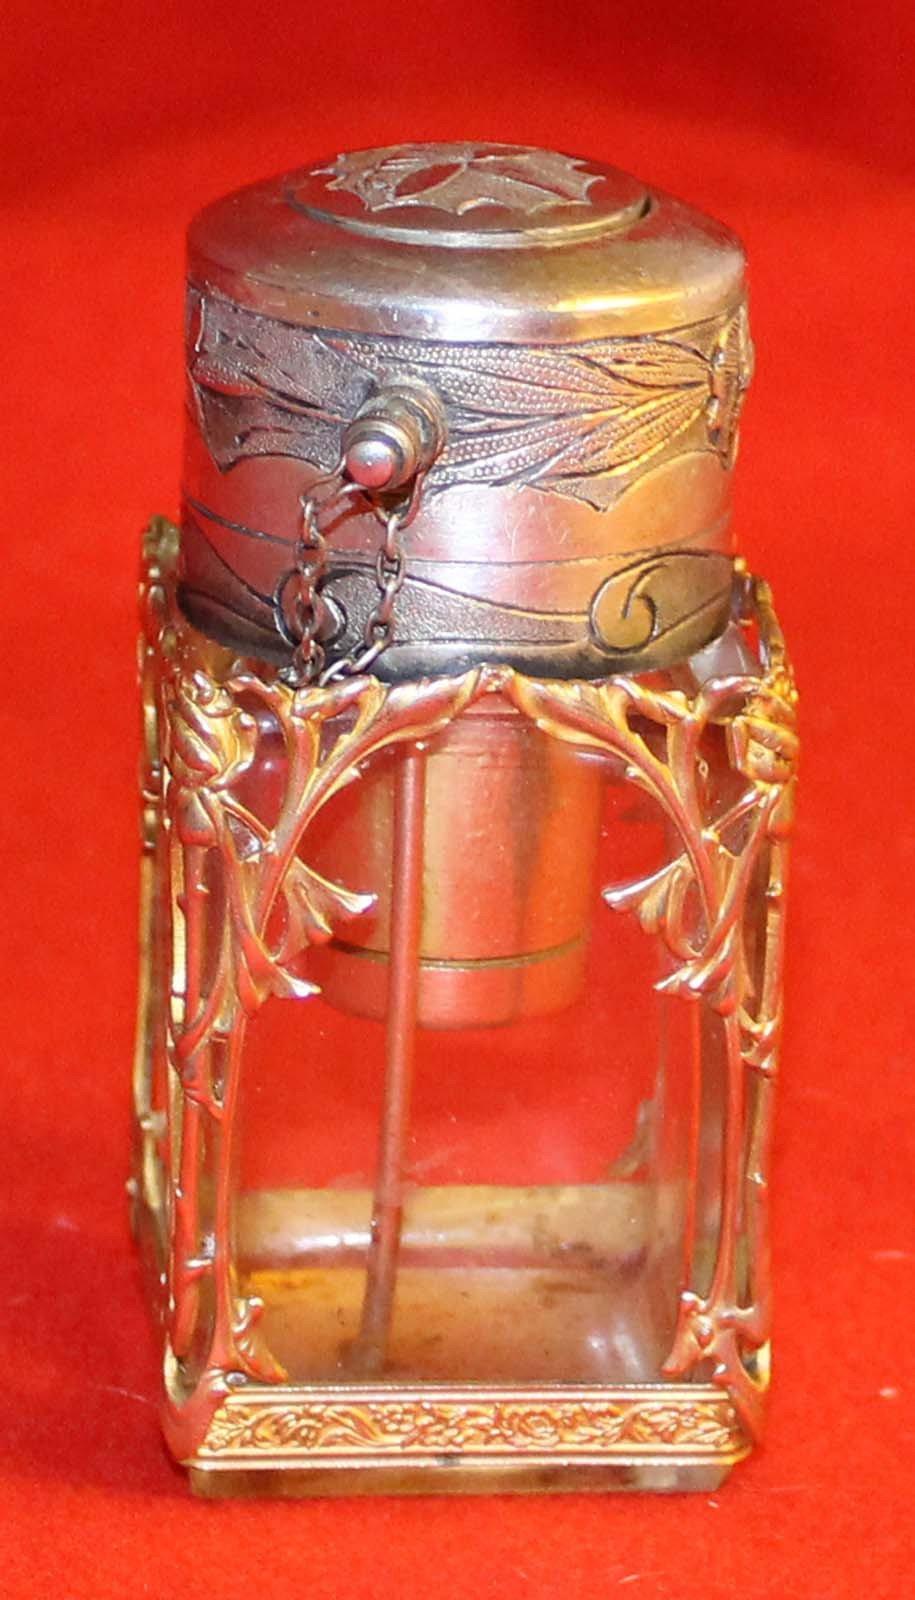 galerie-bosetti-antiquites, vaporisateur art nouveau, face 2